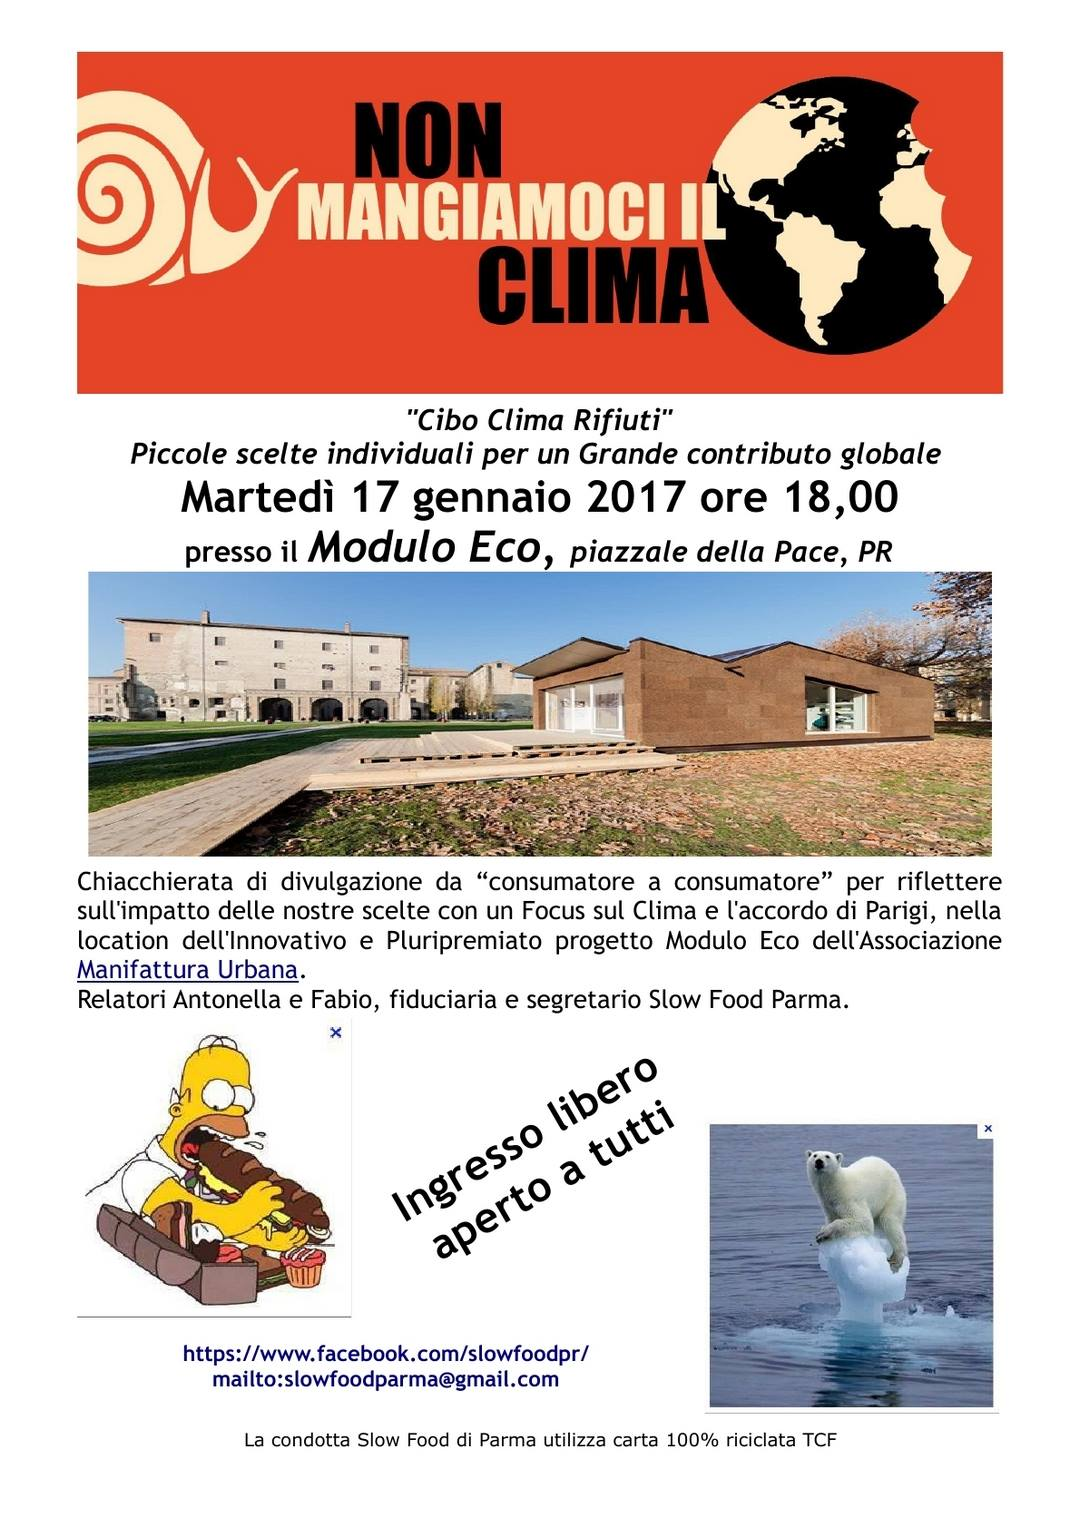 Slow Food Parma : non mangiamoci il clima